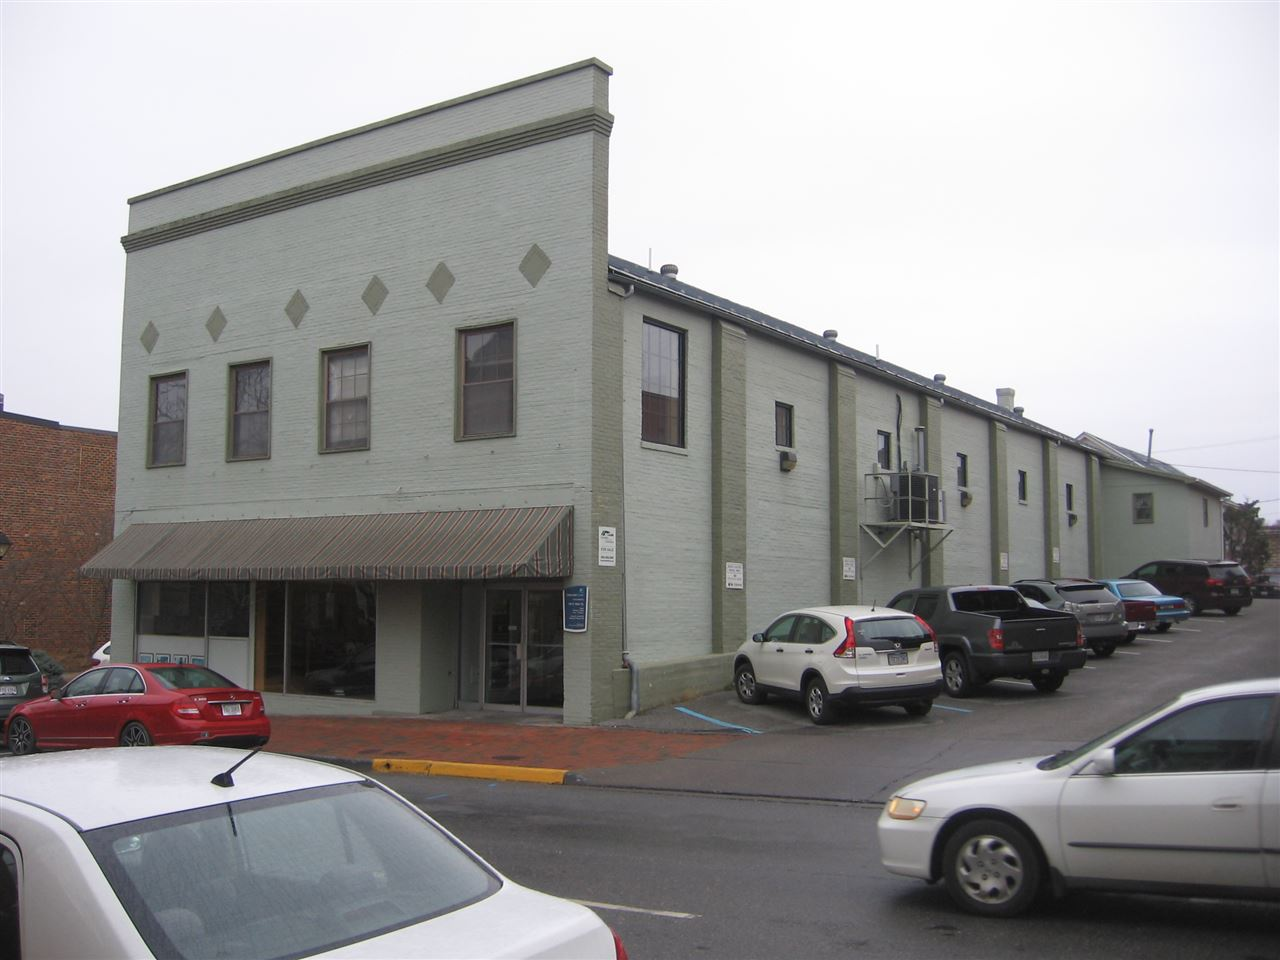 146 S MAIN ST, LEXINGTON, VA 24450